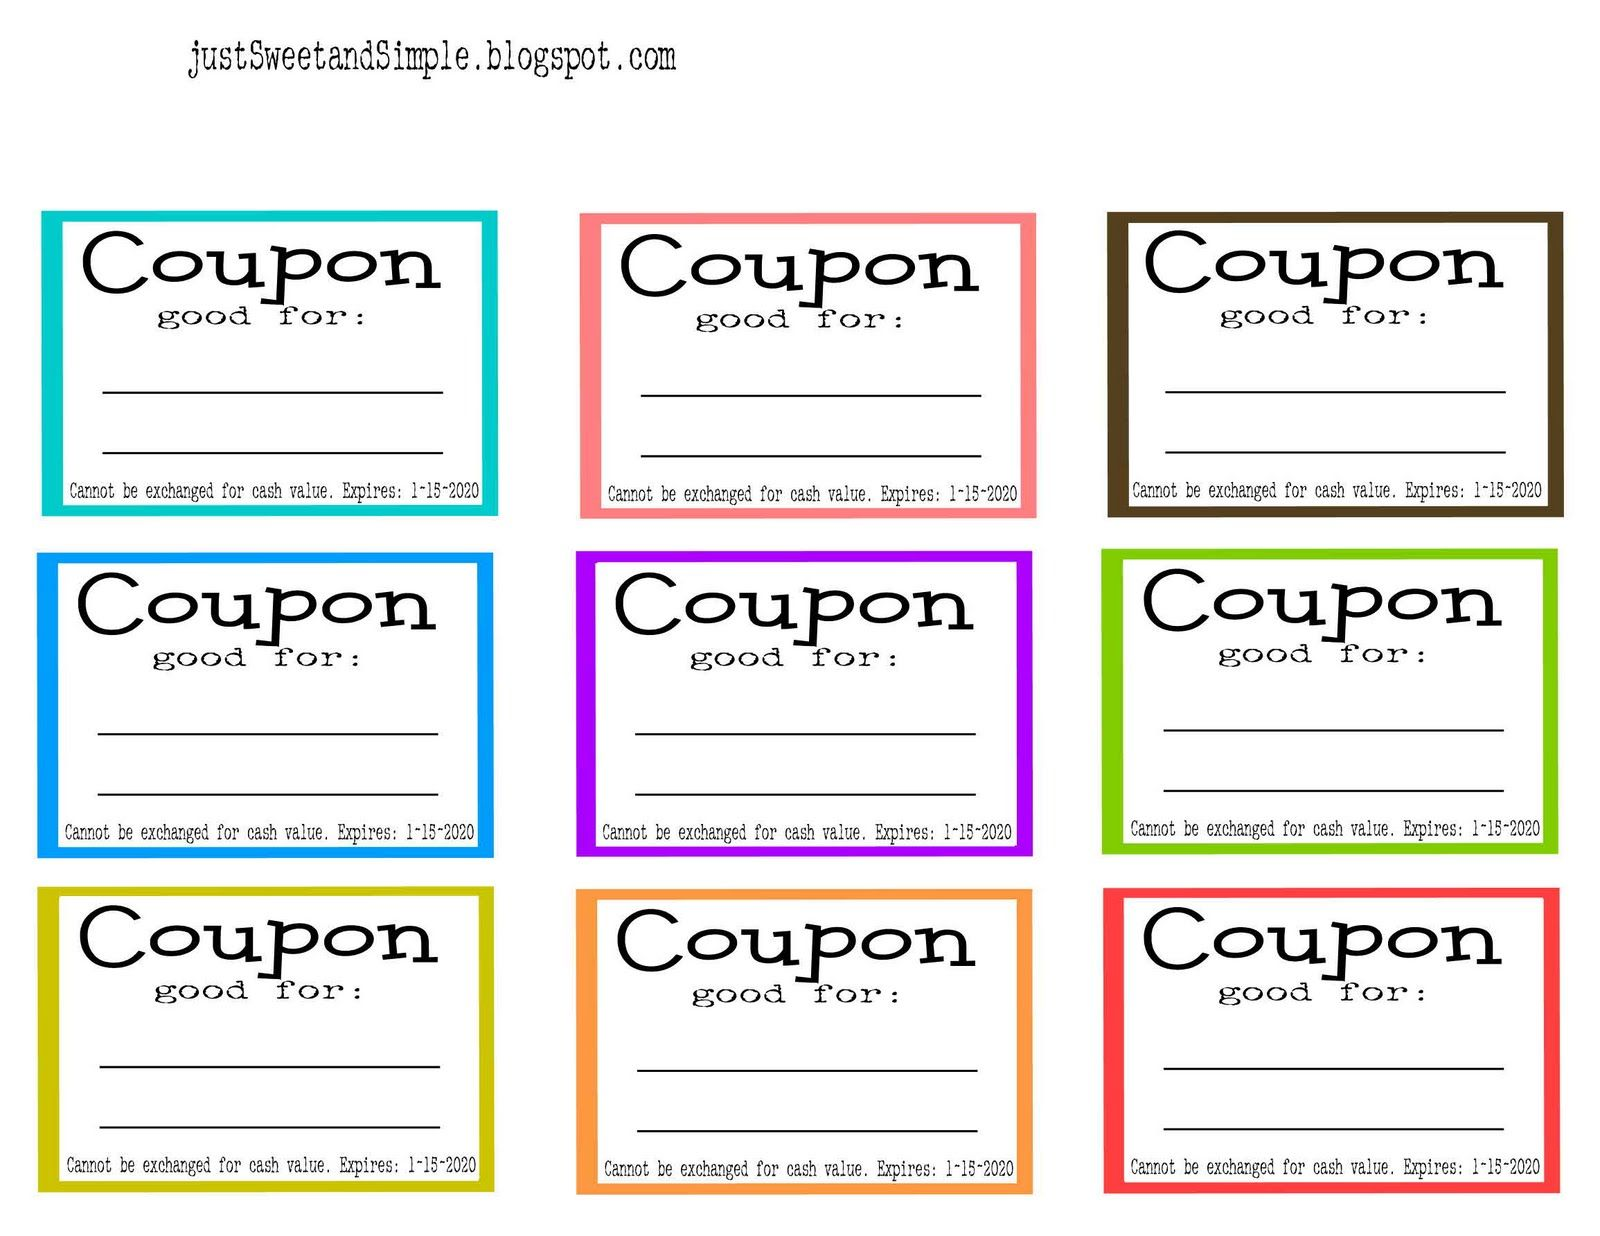 coupon books for husband